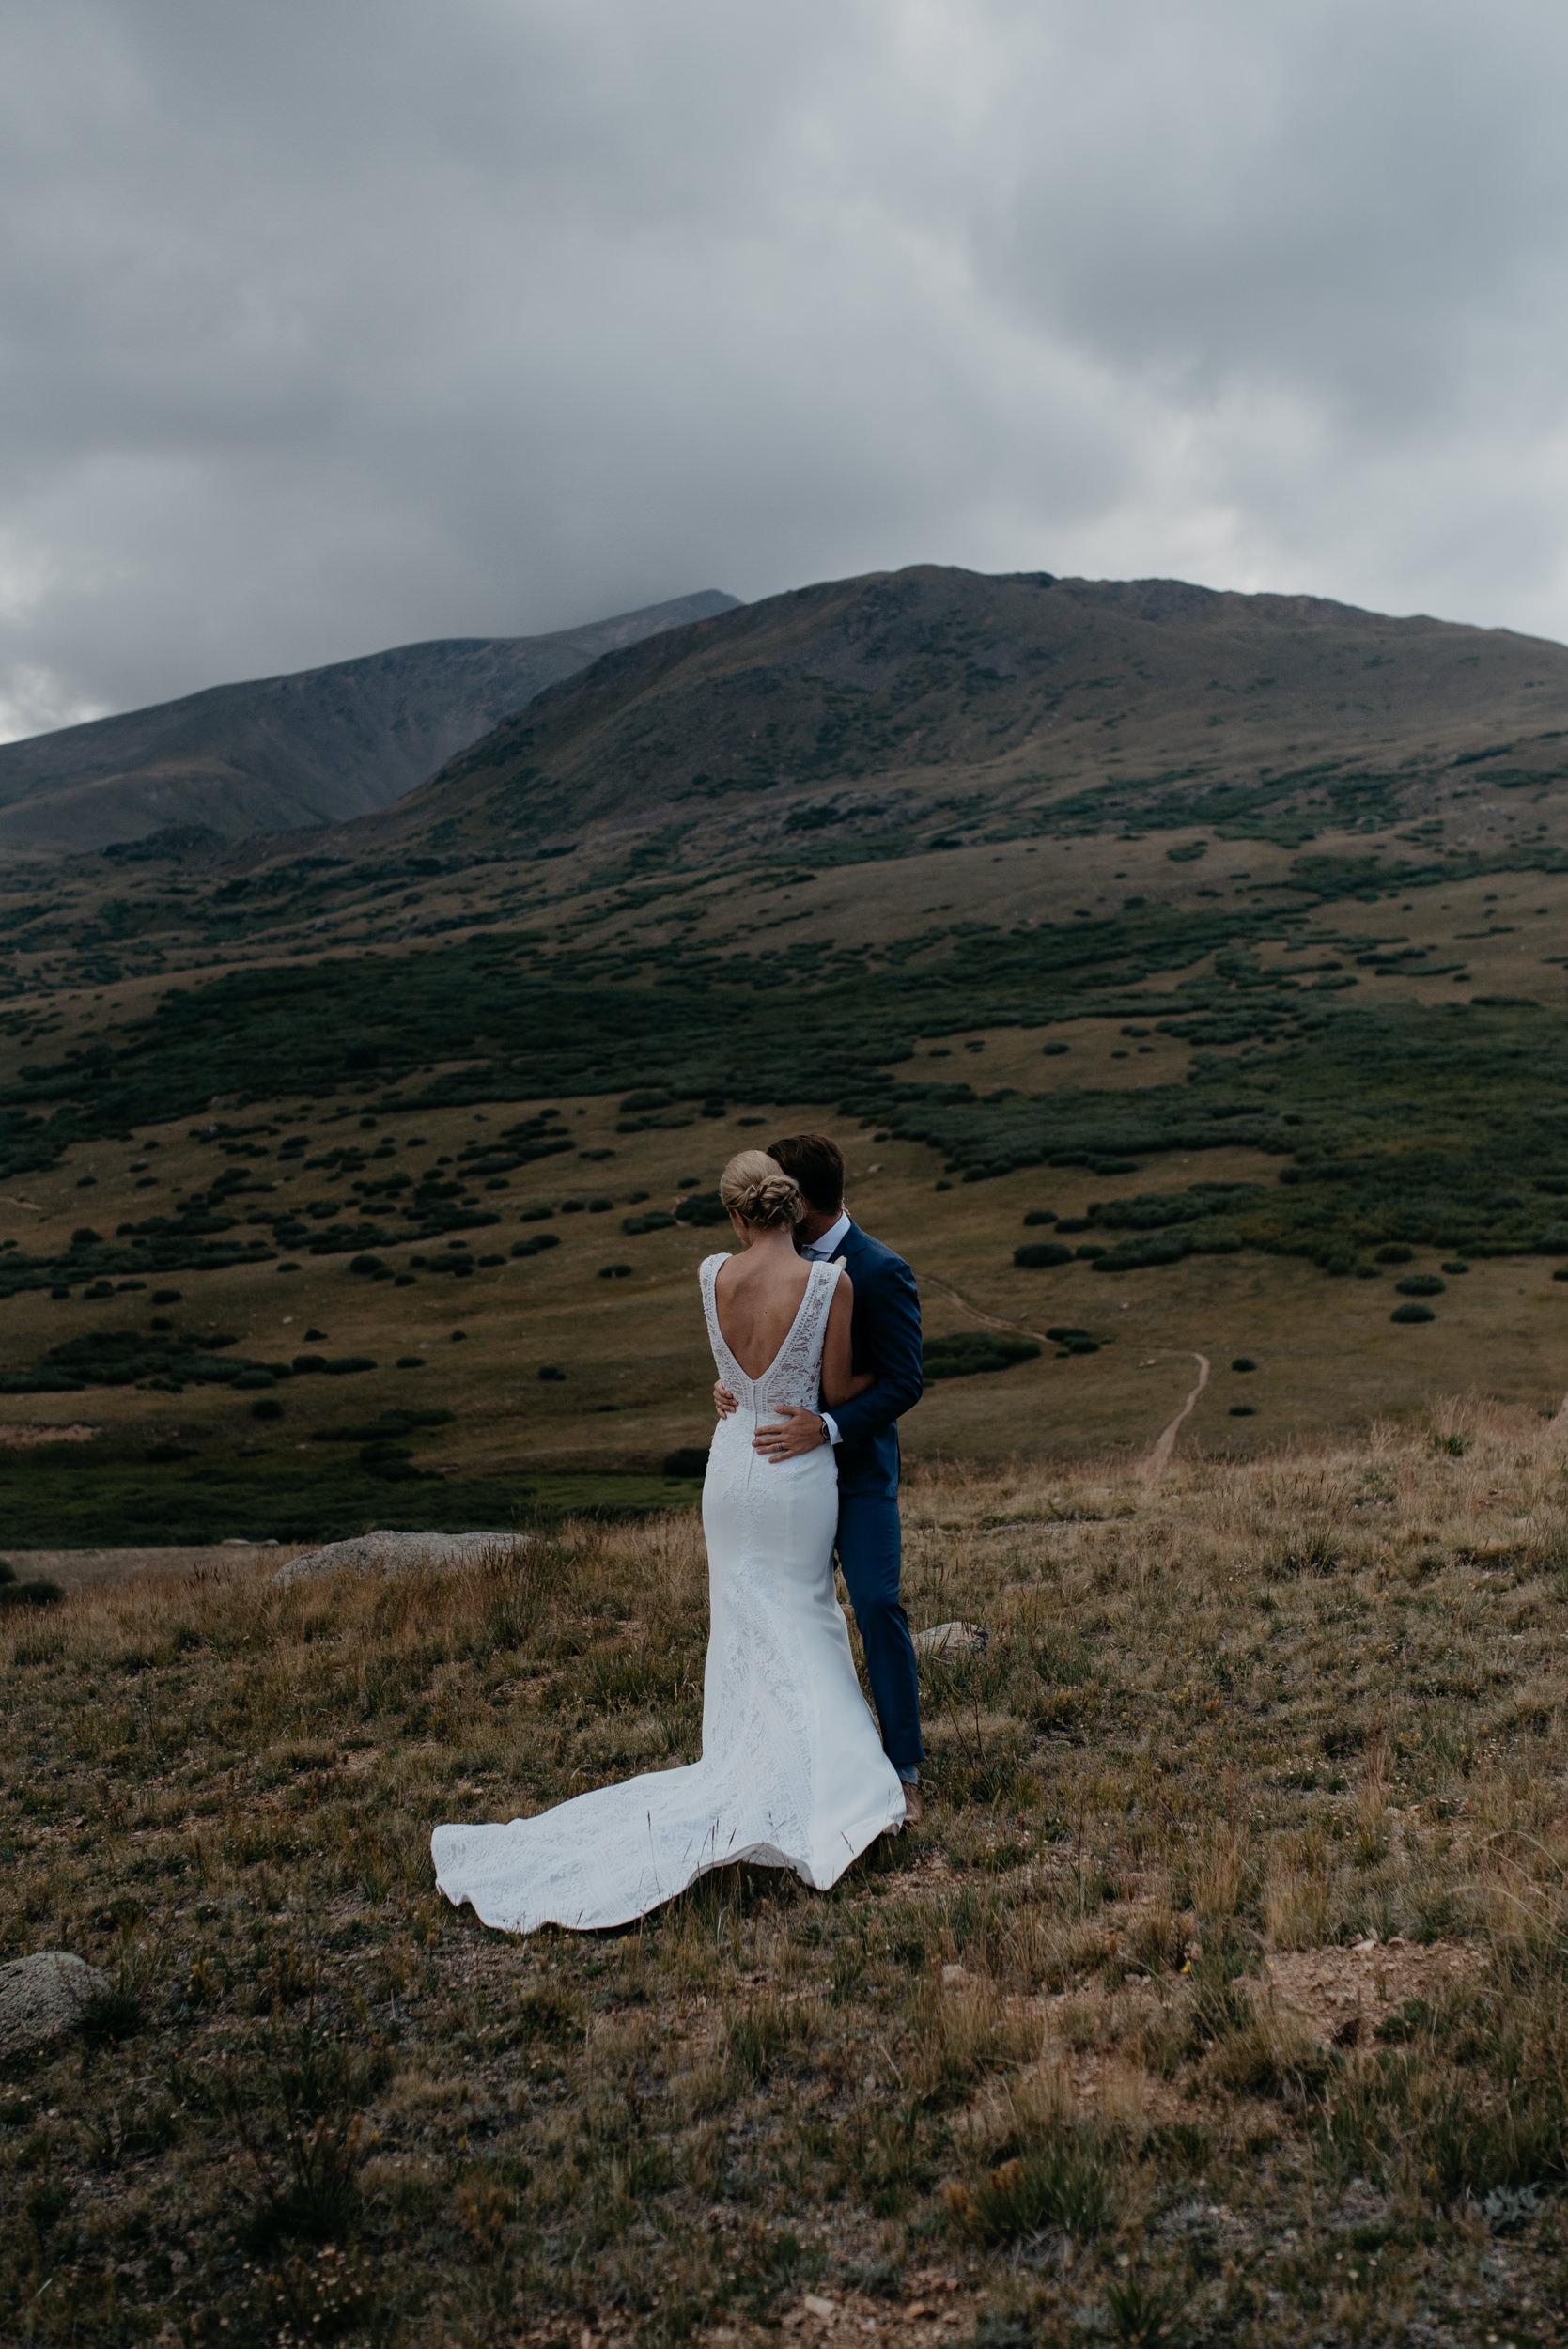 Colorado elopement at Guenella Pass. Colorado based elopement and wedding photographer. Colorado adventure elopement in Georgetown.